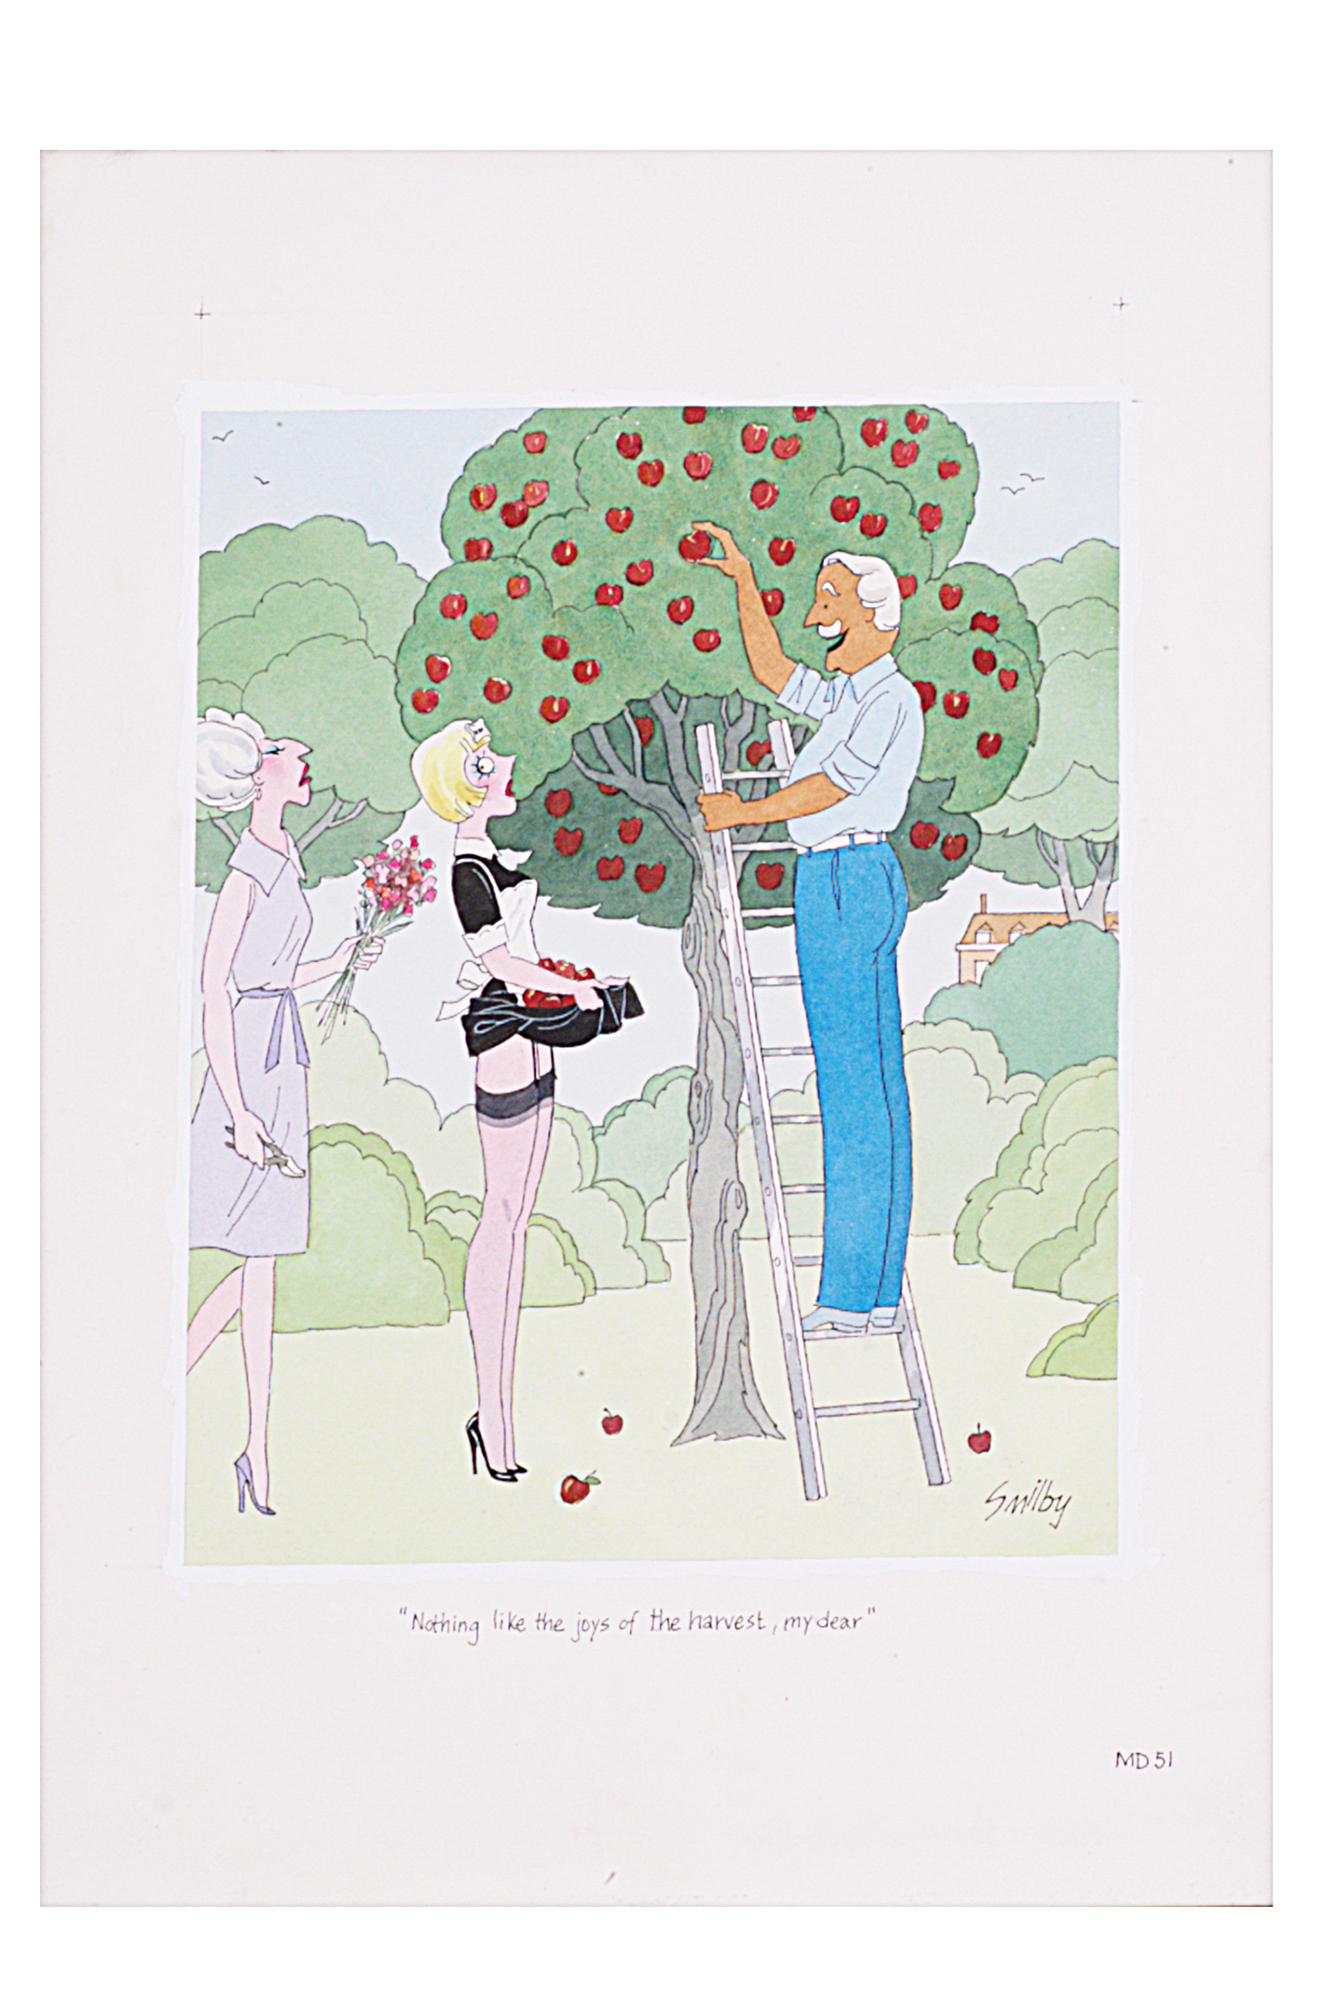 Lot 28 - Smilby, Francis Wilford-Smith 'I think not, Hubert' cartoon artwork